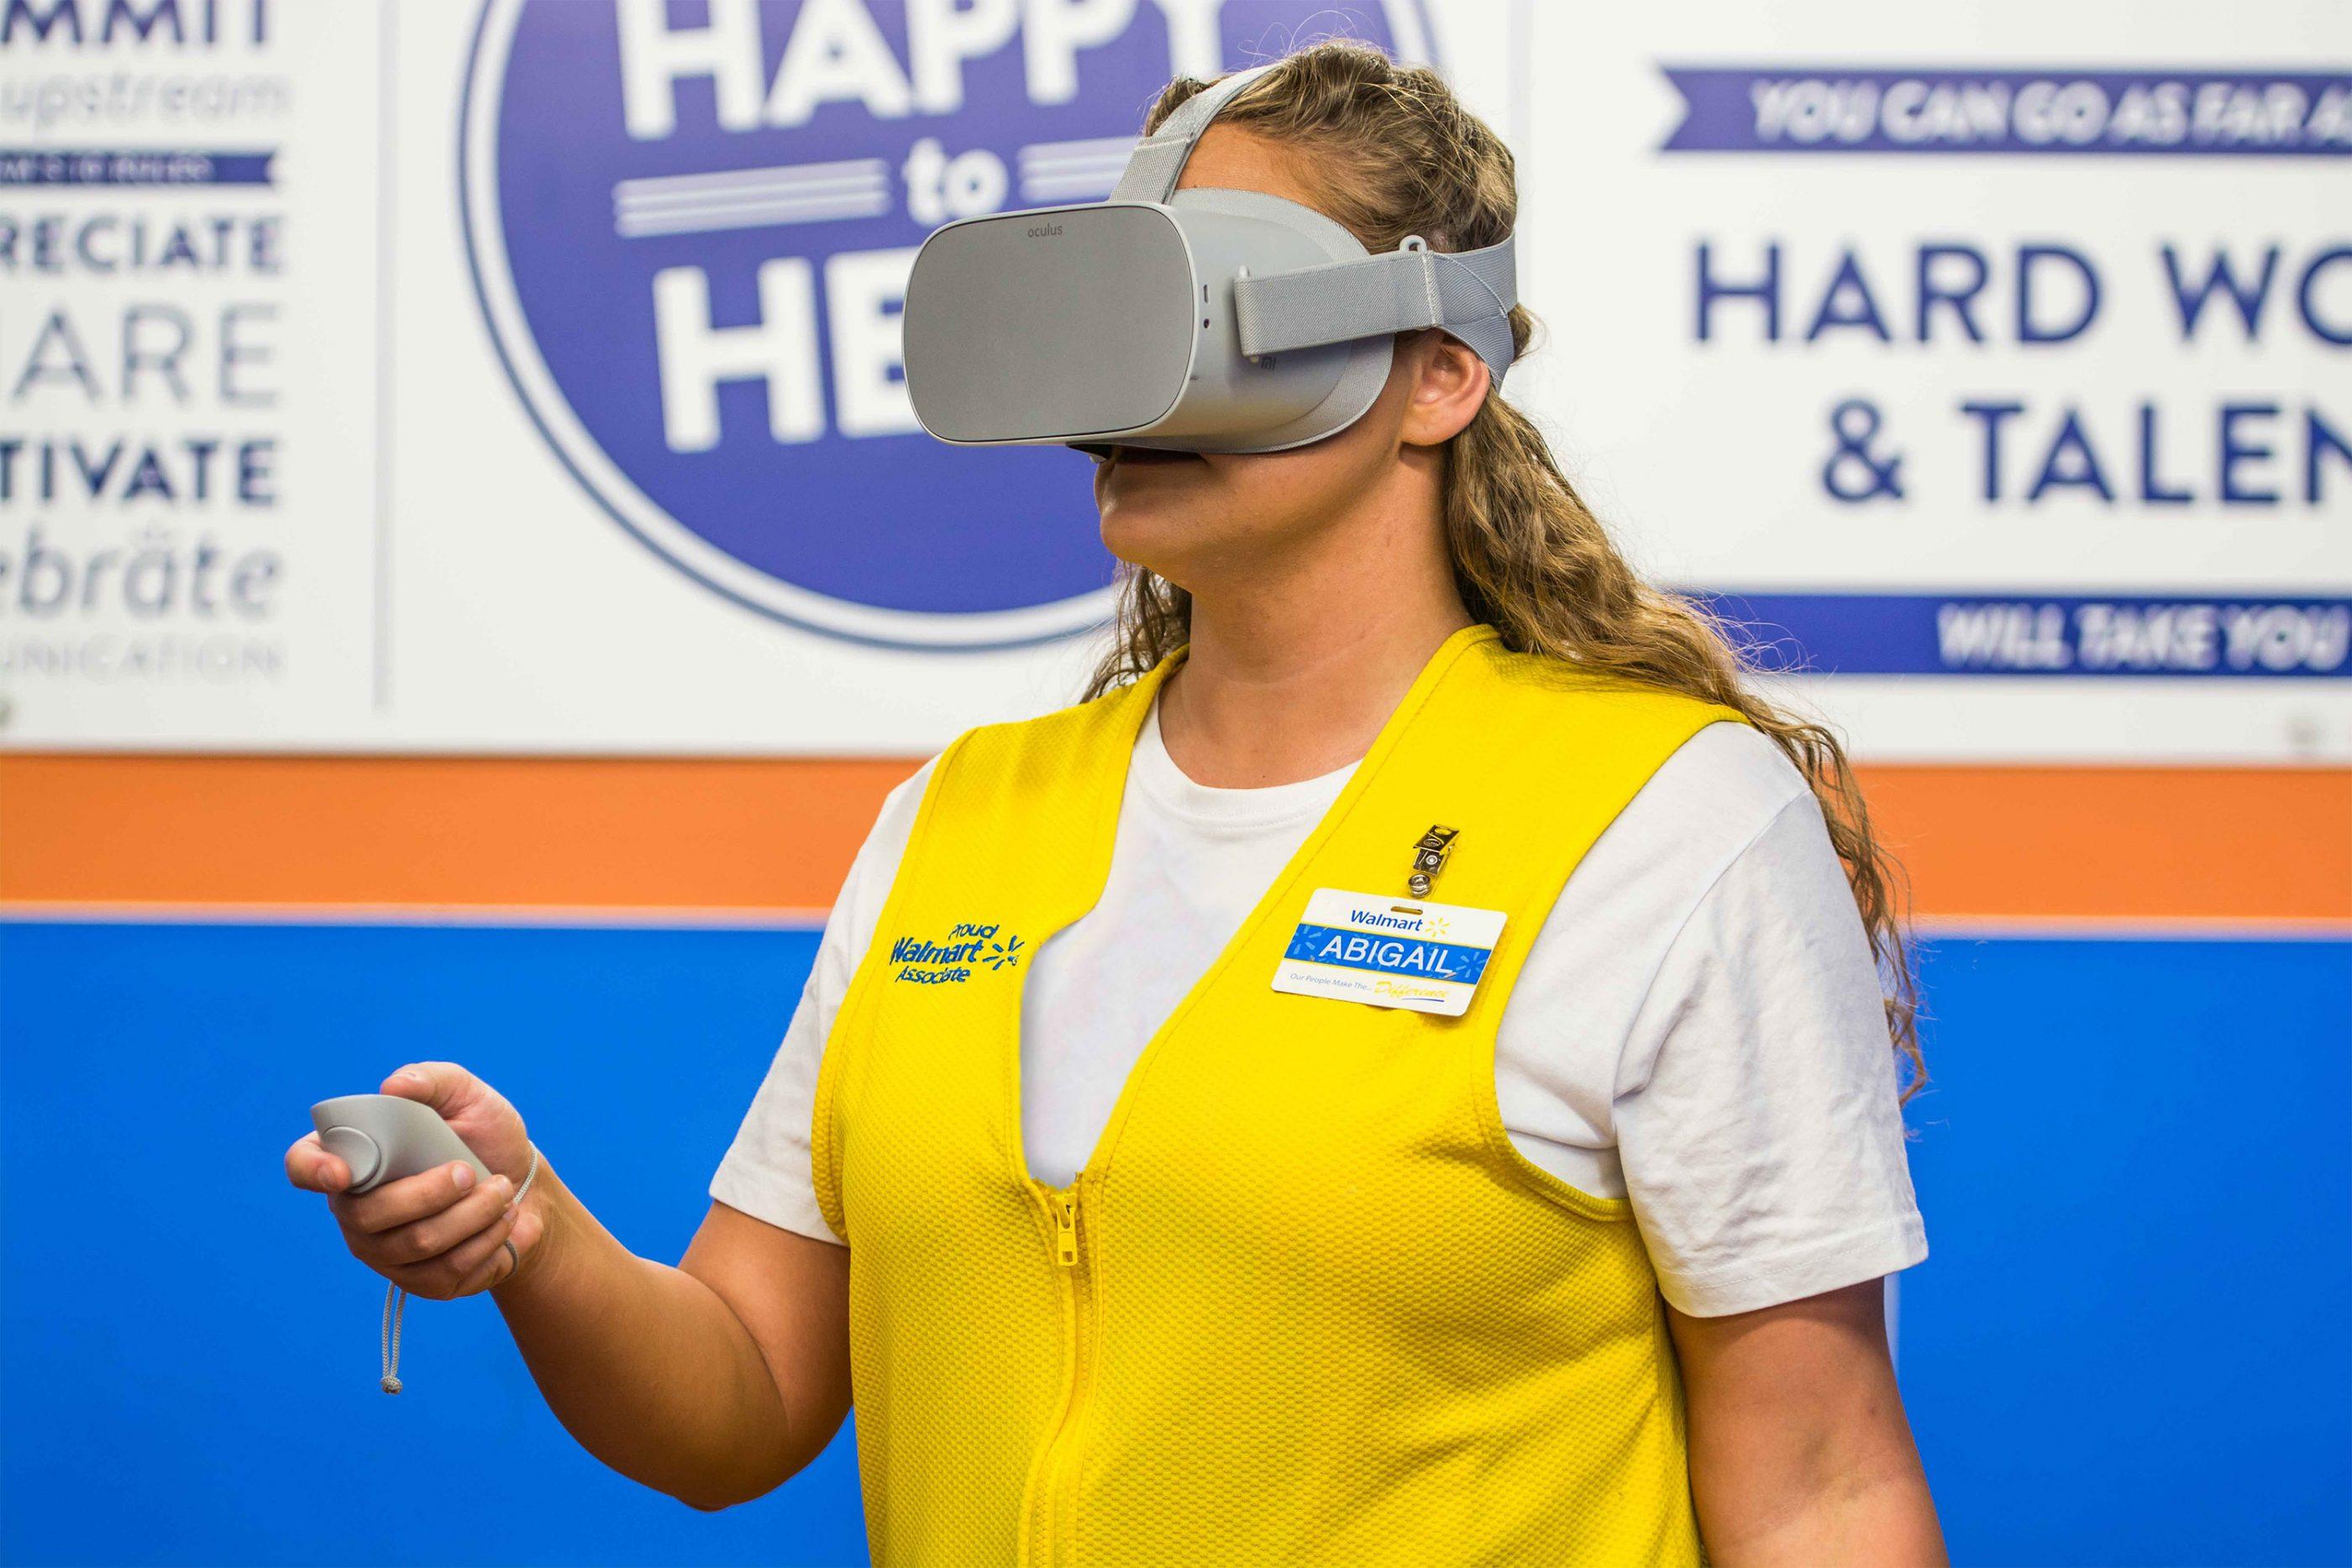 Walmart employee using VR